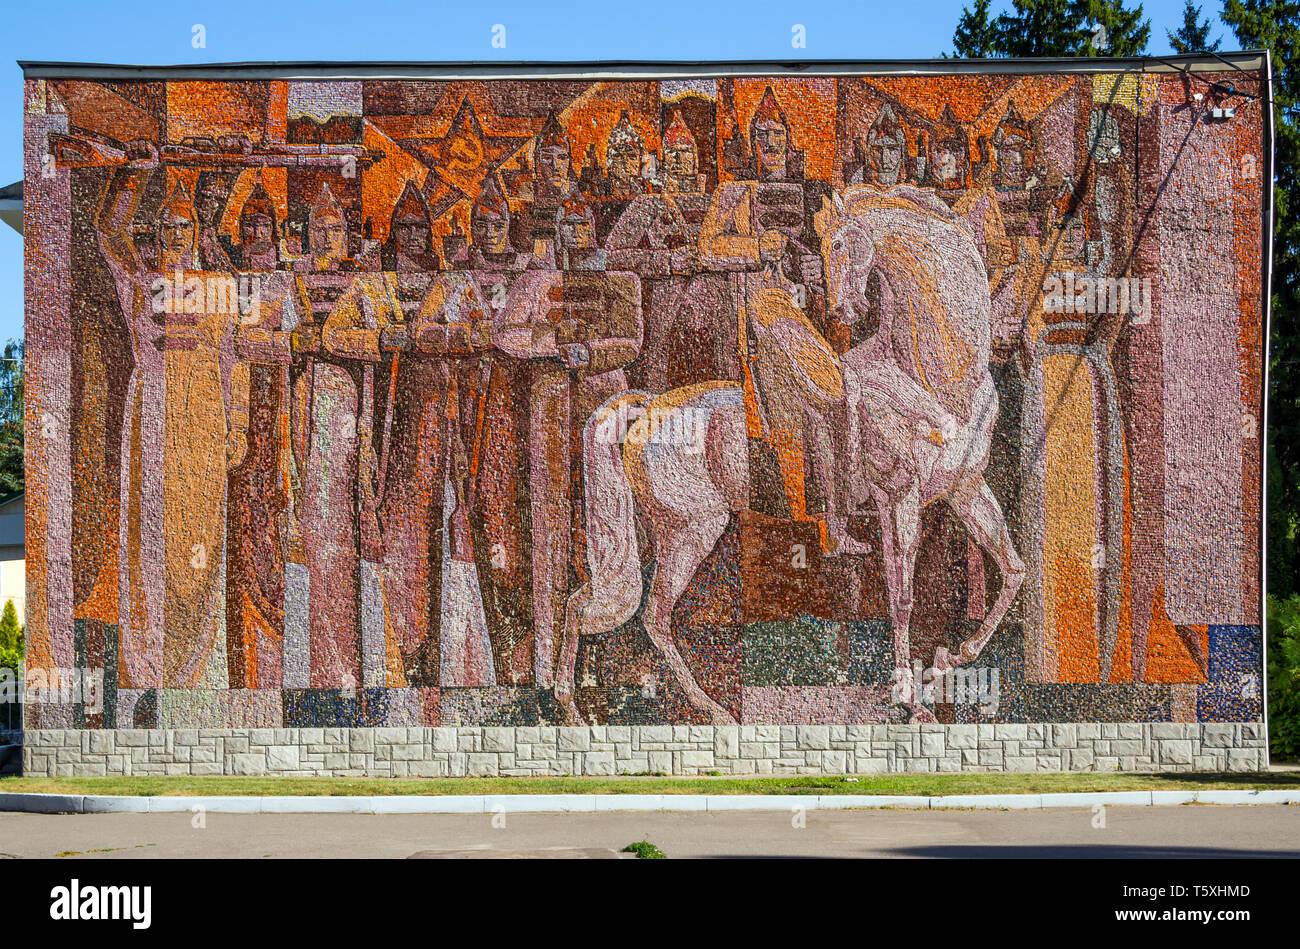 Voronezh, Russia - August 26, 2018: Mosaic panel on a revolutionary theme on the building of the sanatorium named after Dzerzhinsky, village Chertovit - Stock Image